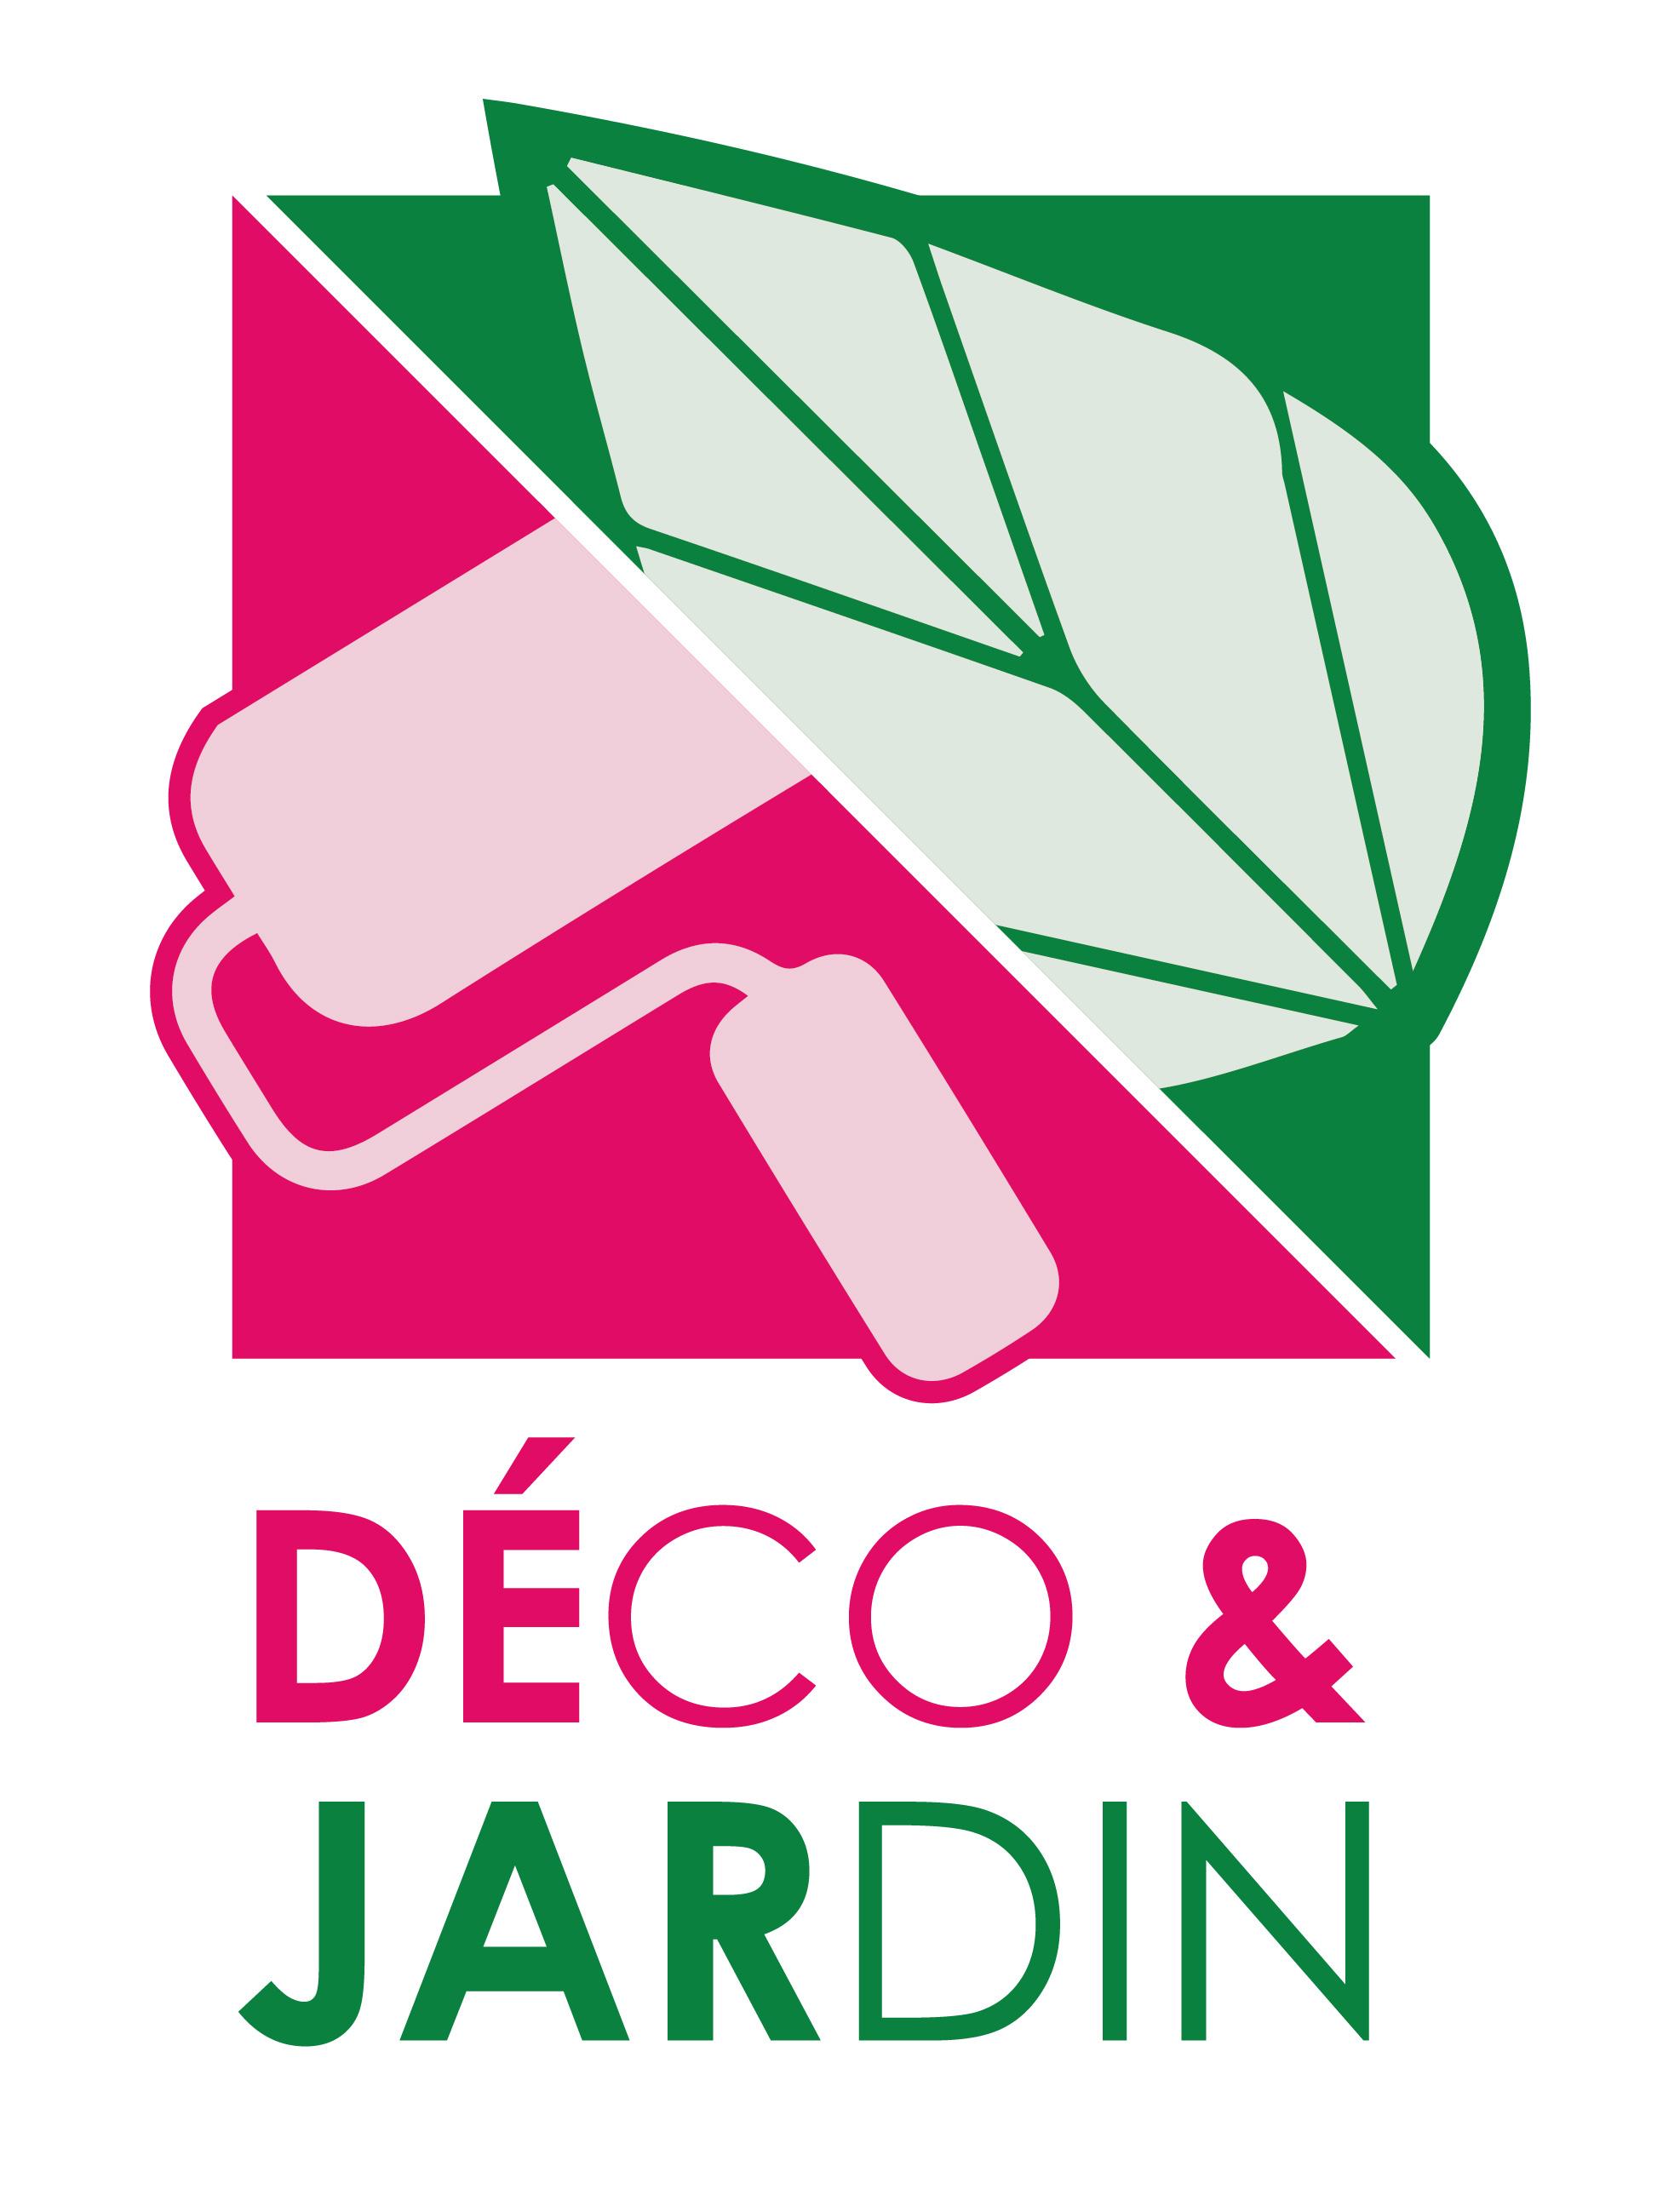 Emejing salon deco et jardin tournai photos amazing for Salon jardin tournai 2016